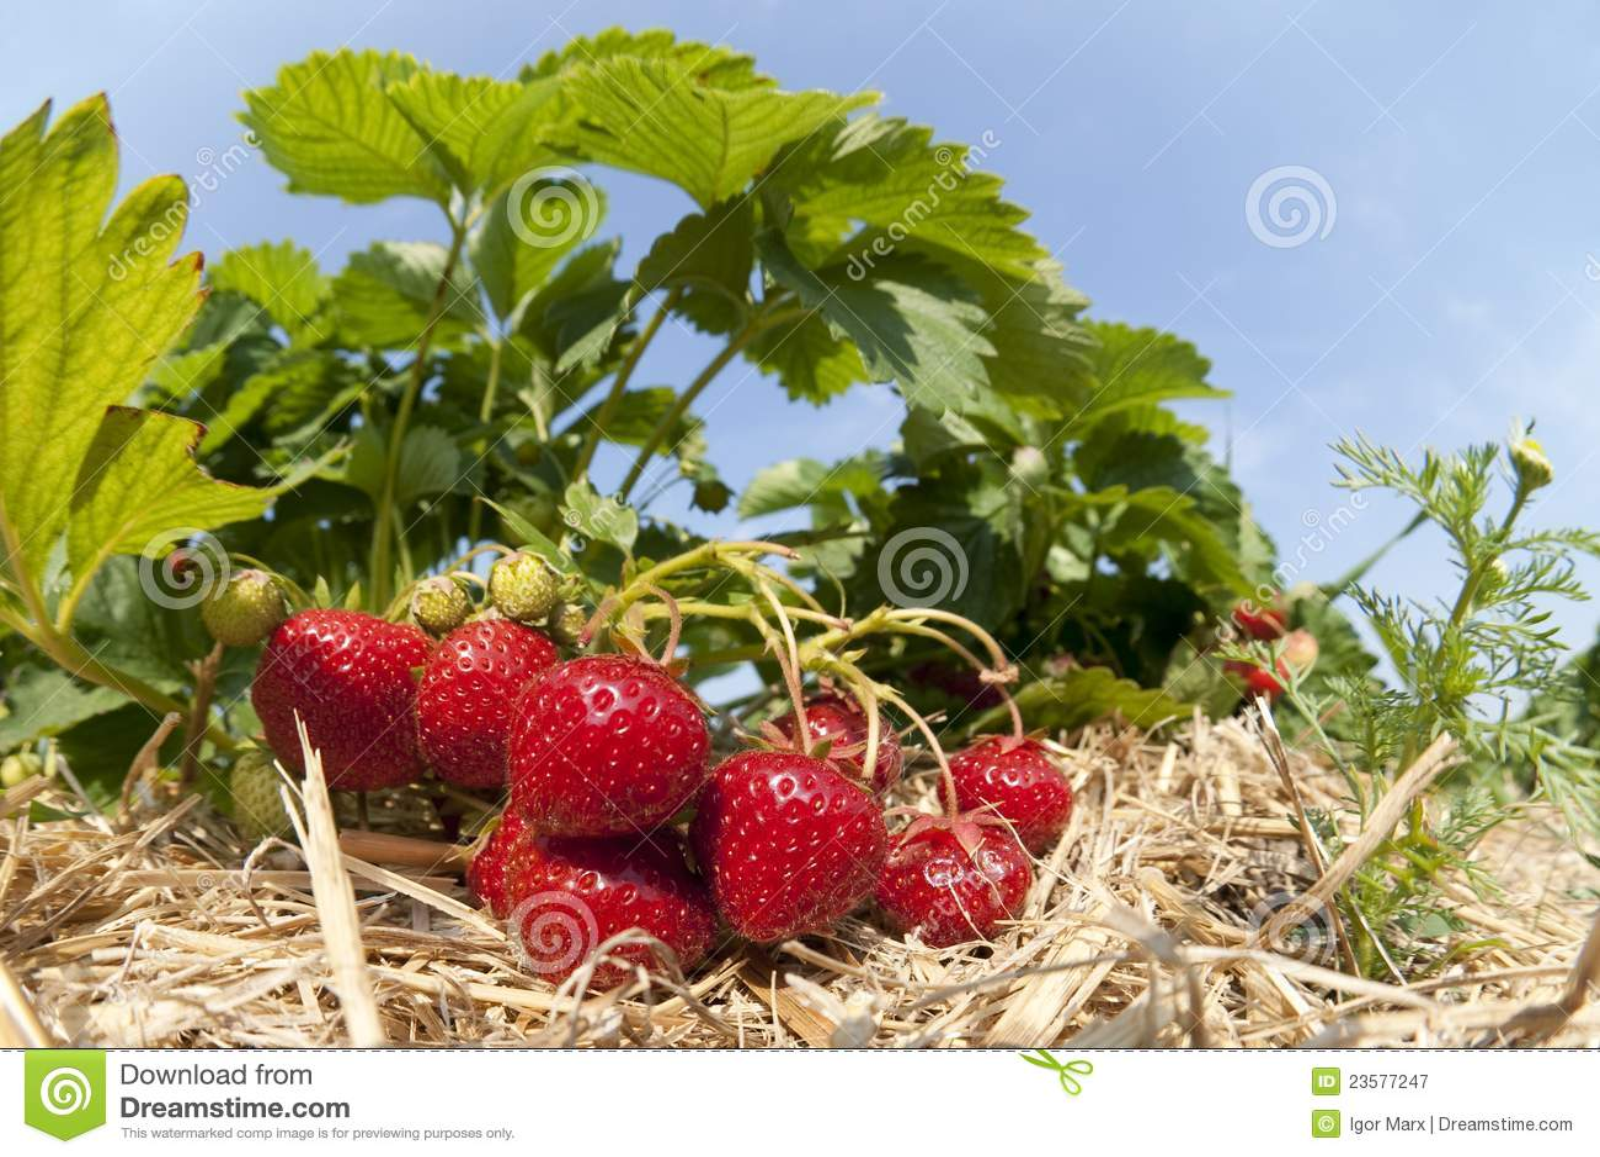 Strawberry Plantation Royalty Free Stock Photography Image 23577247